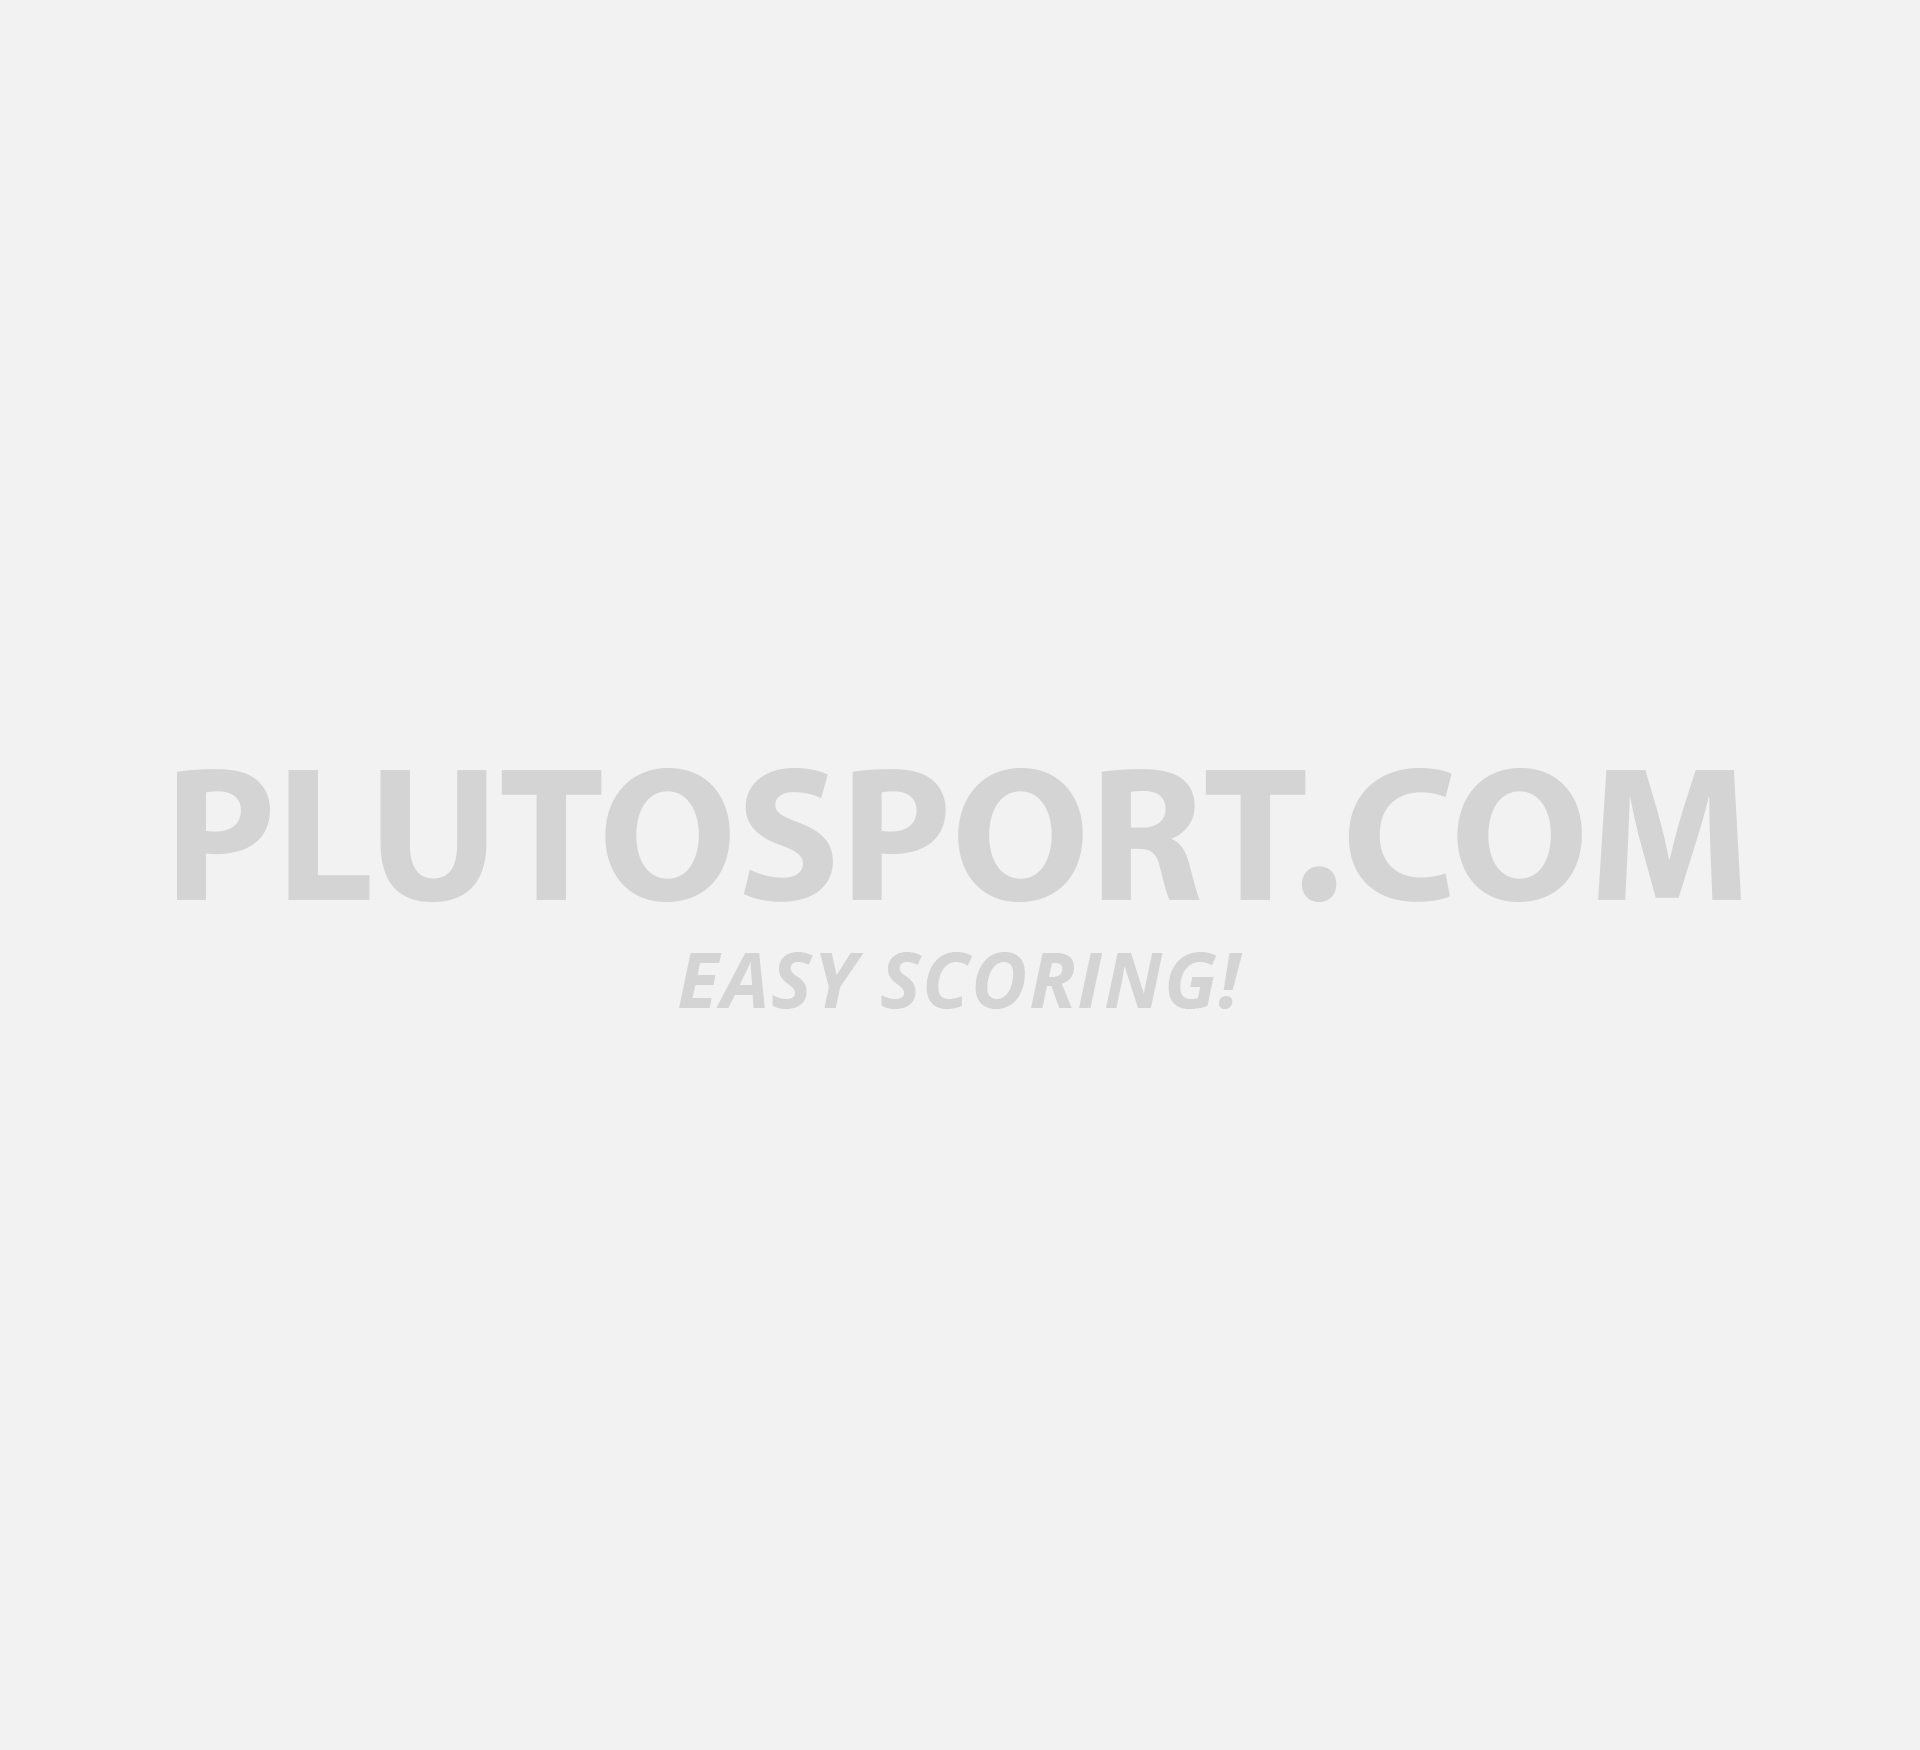 a0b6811d1c55cc Bergstein Lux Kids Snowboots - Snowboots - Shoes - Lifestyle - Sports |  Plutosport